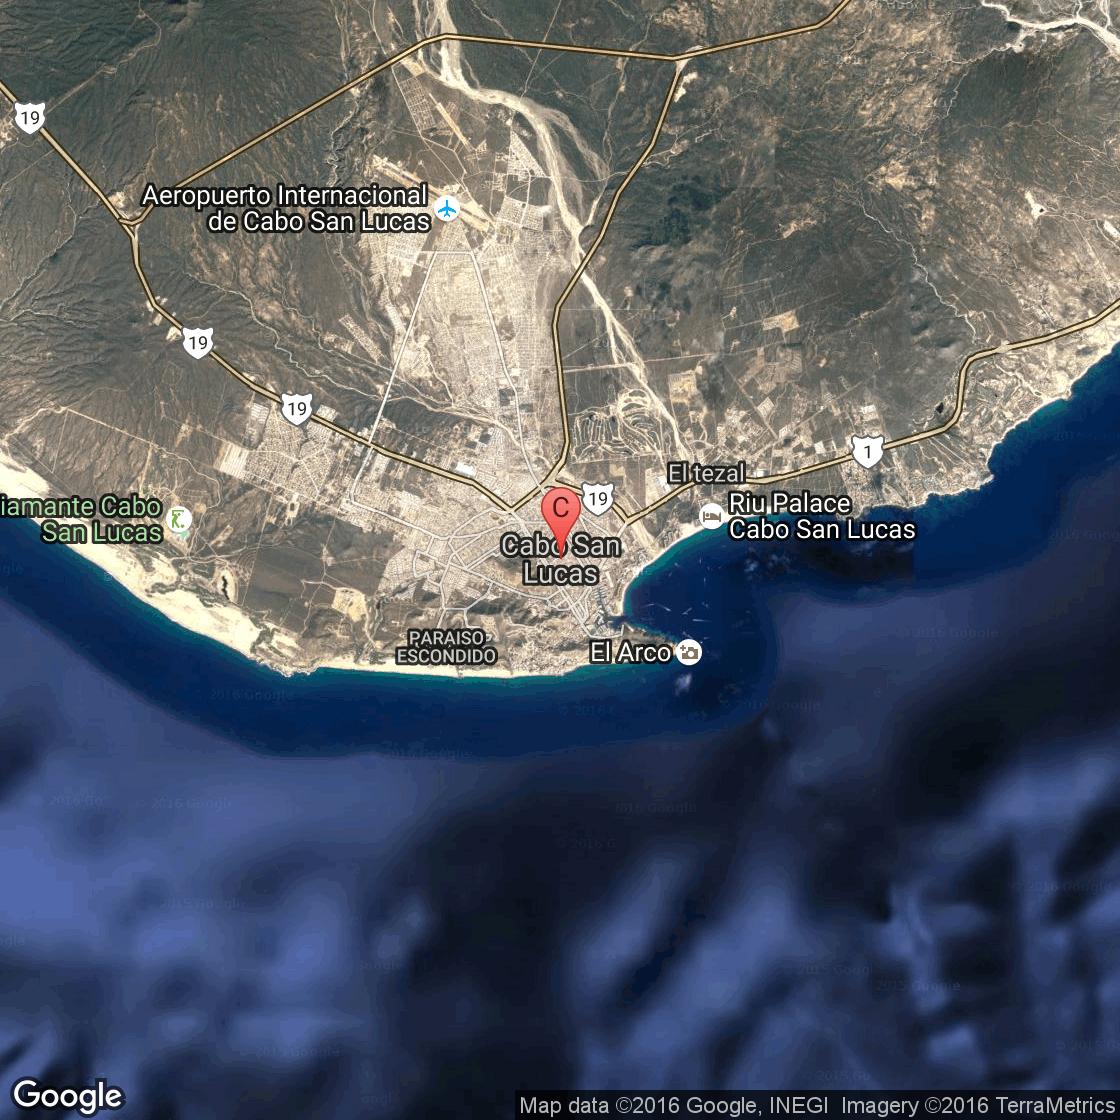 Best Hotels in Cabo San Lucas